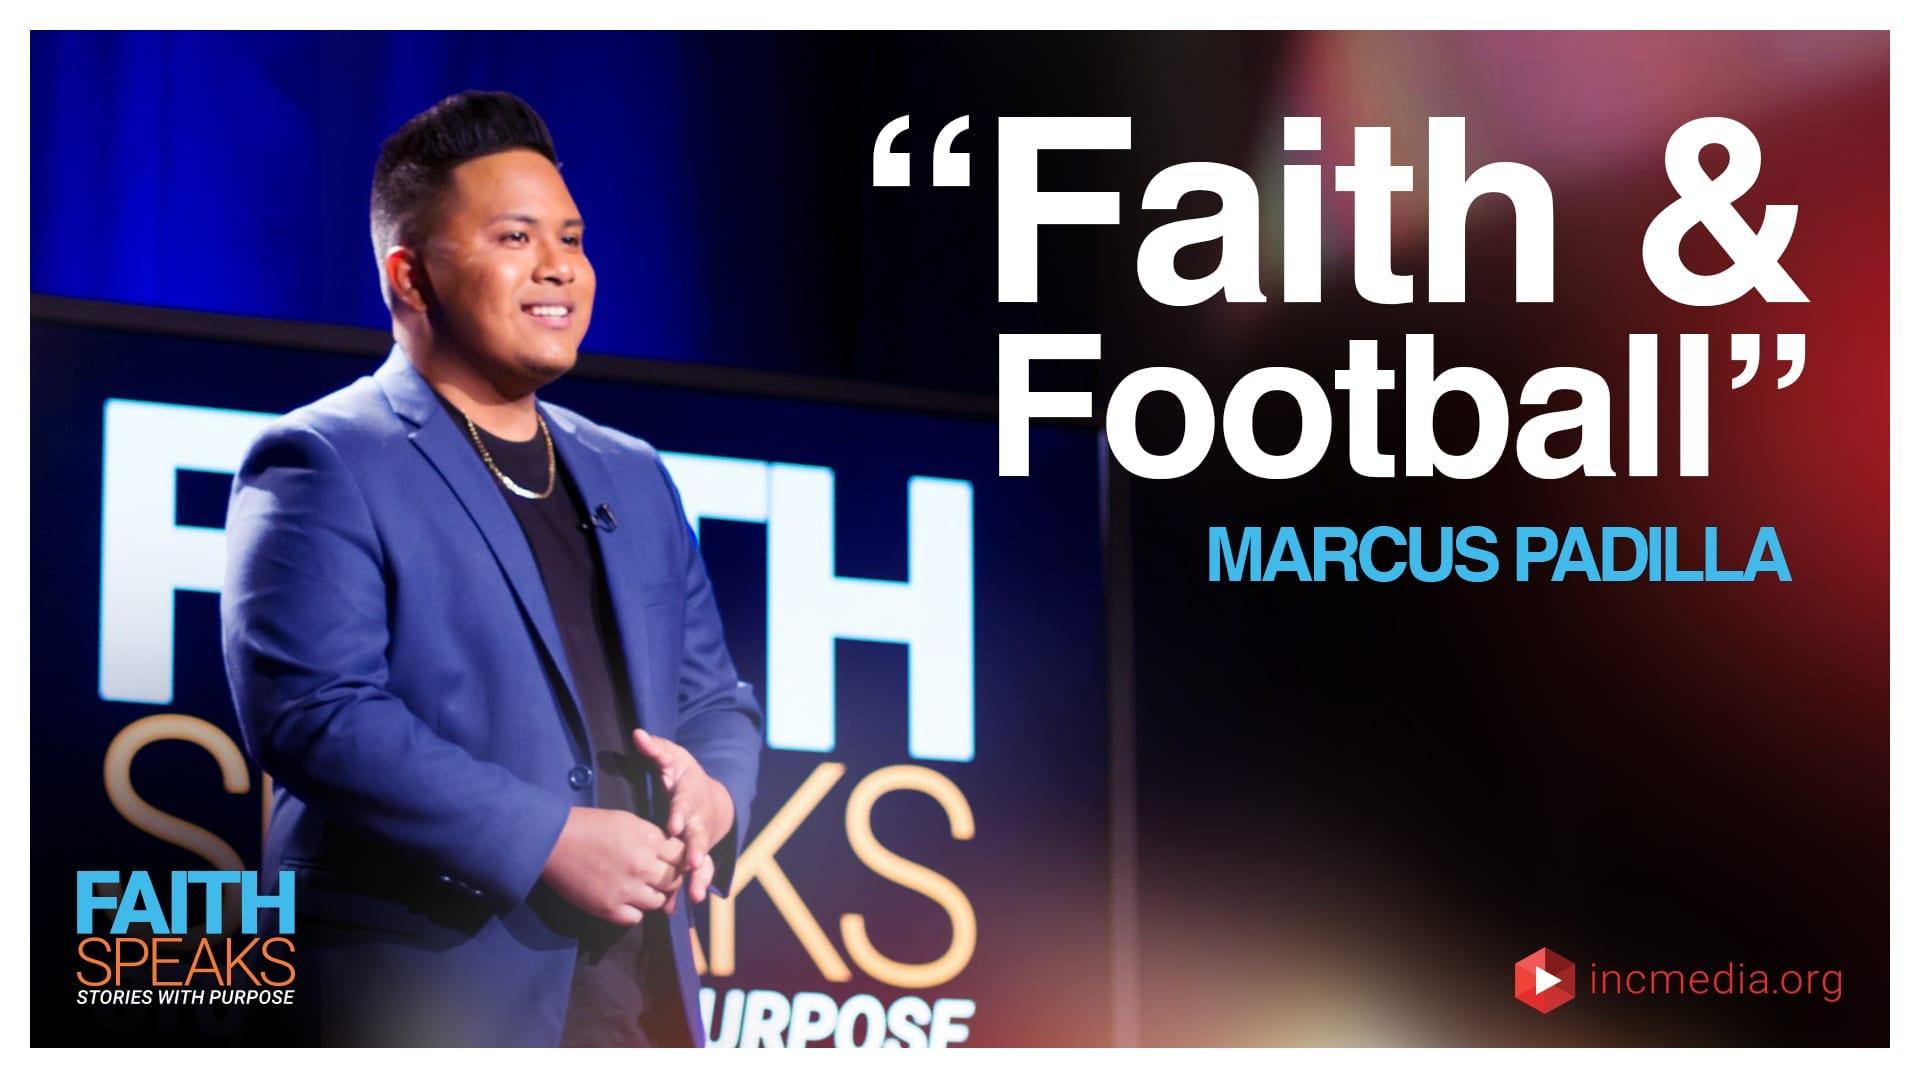 Marcus Padilla: Faith & Football